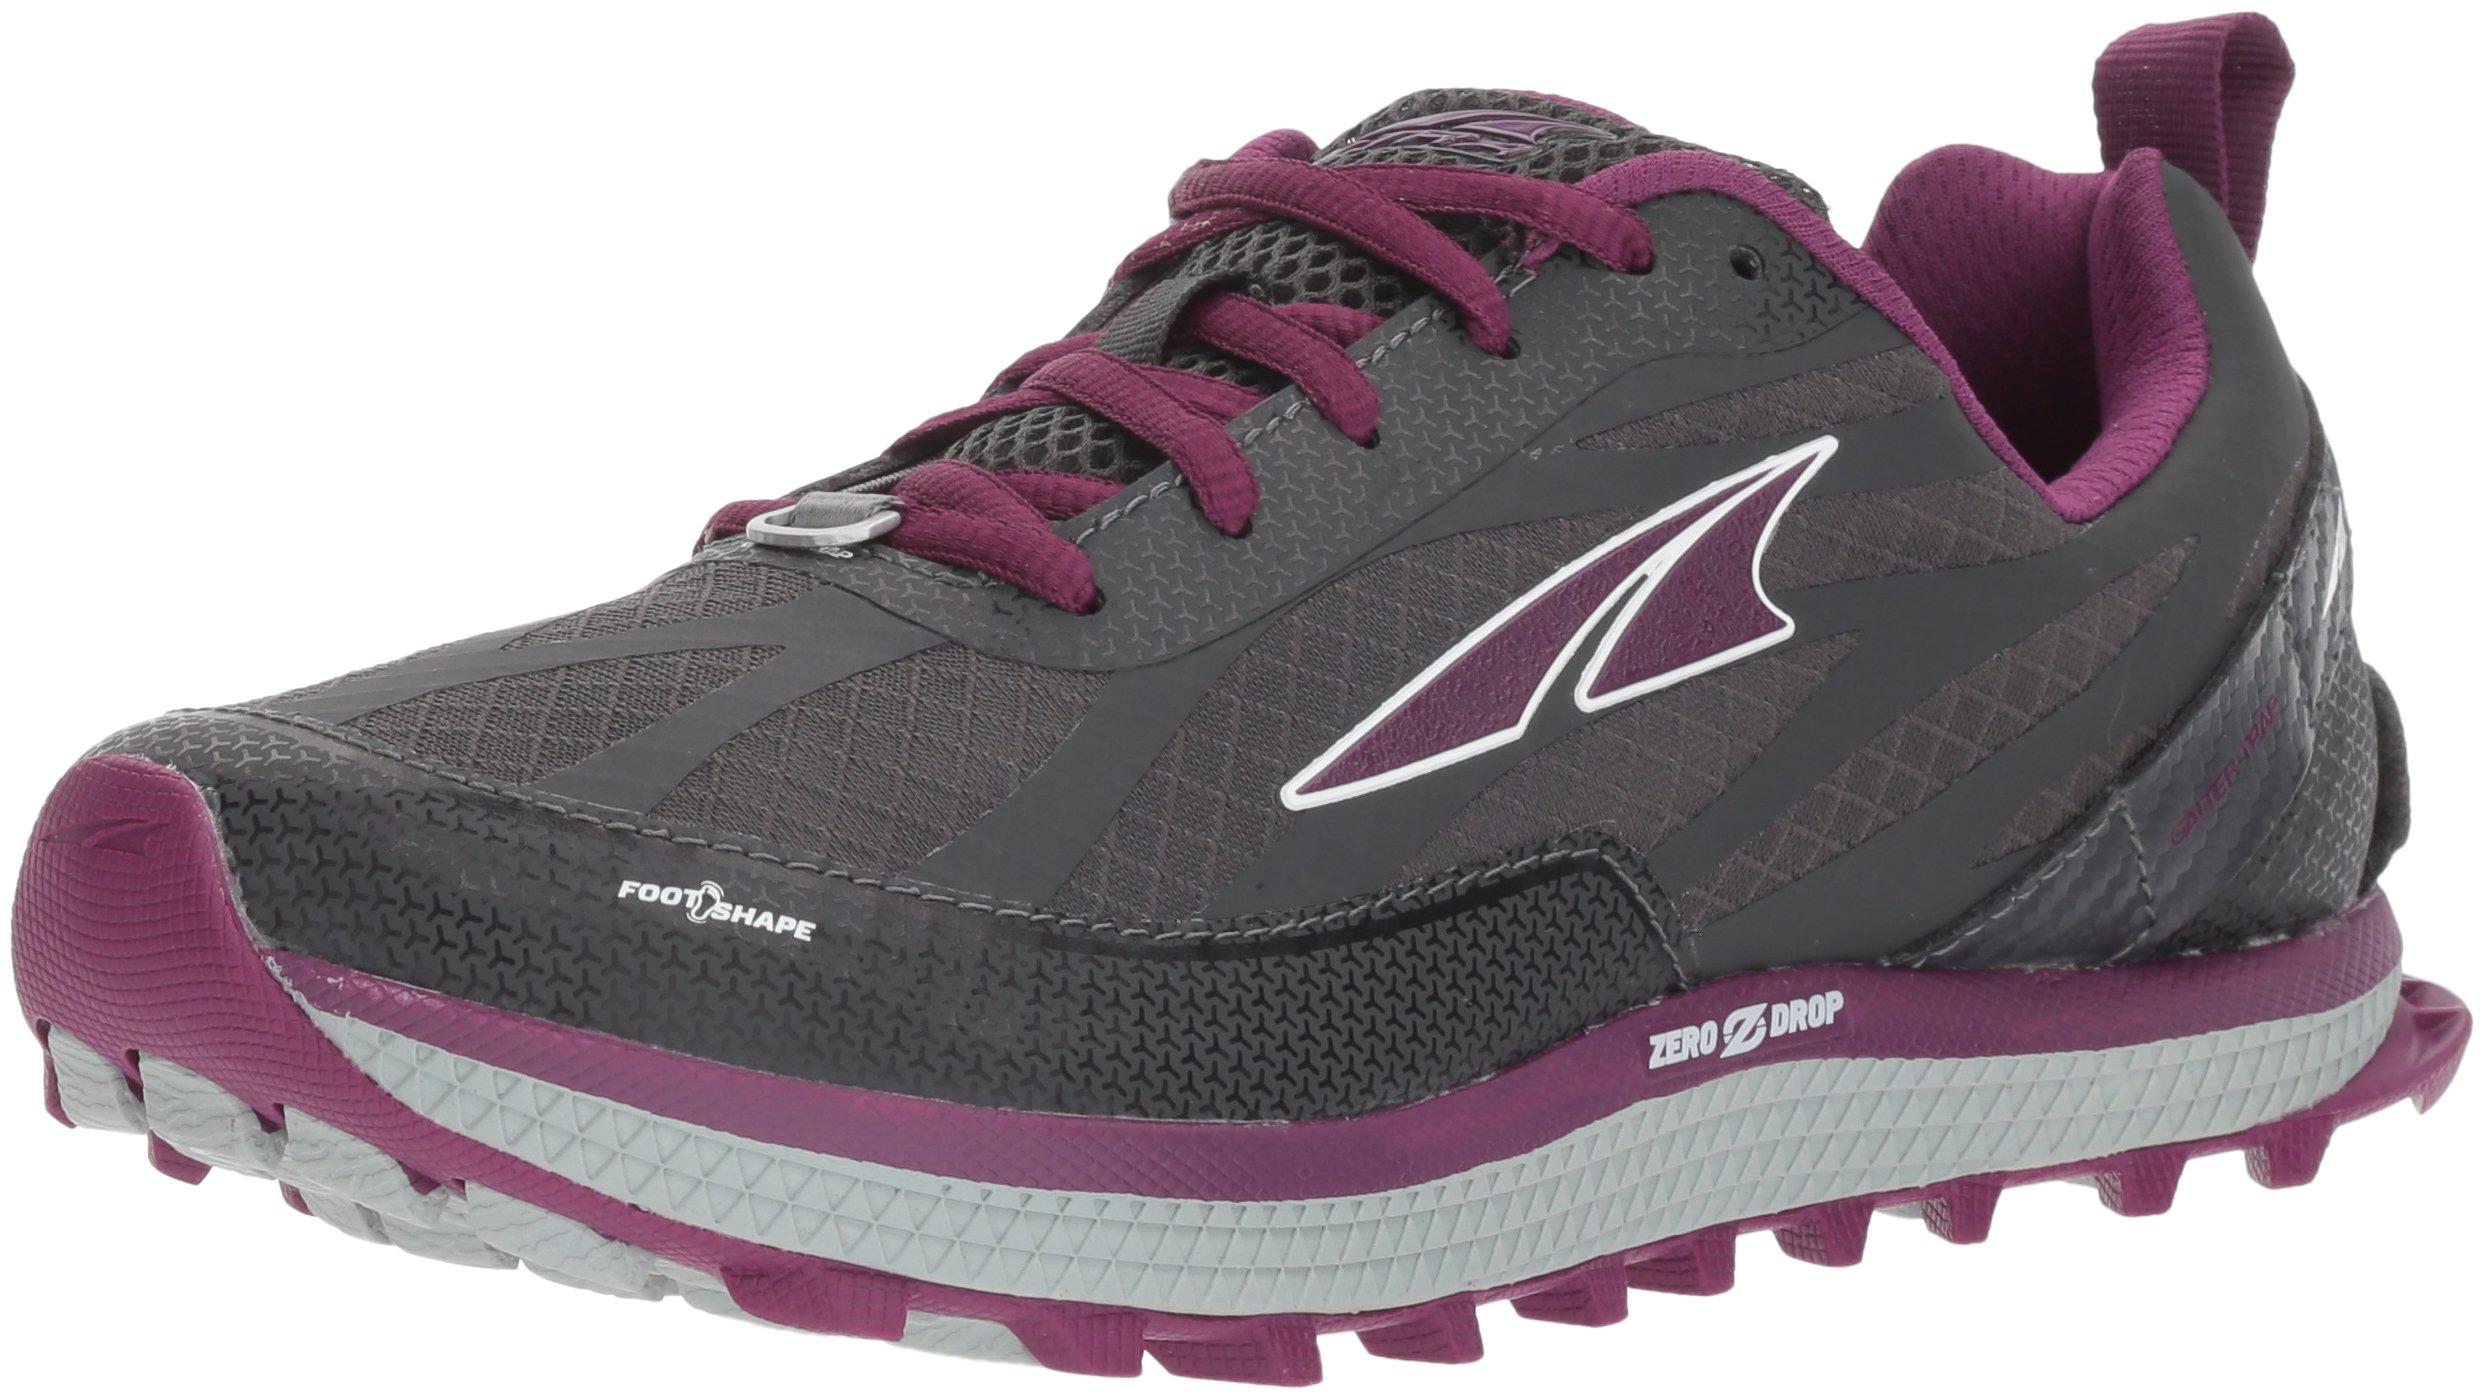 Altra Women's Superior 3.5 Sneaker, Gray/Purple, 7.5 Regular US